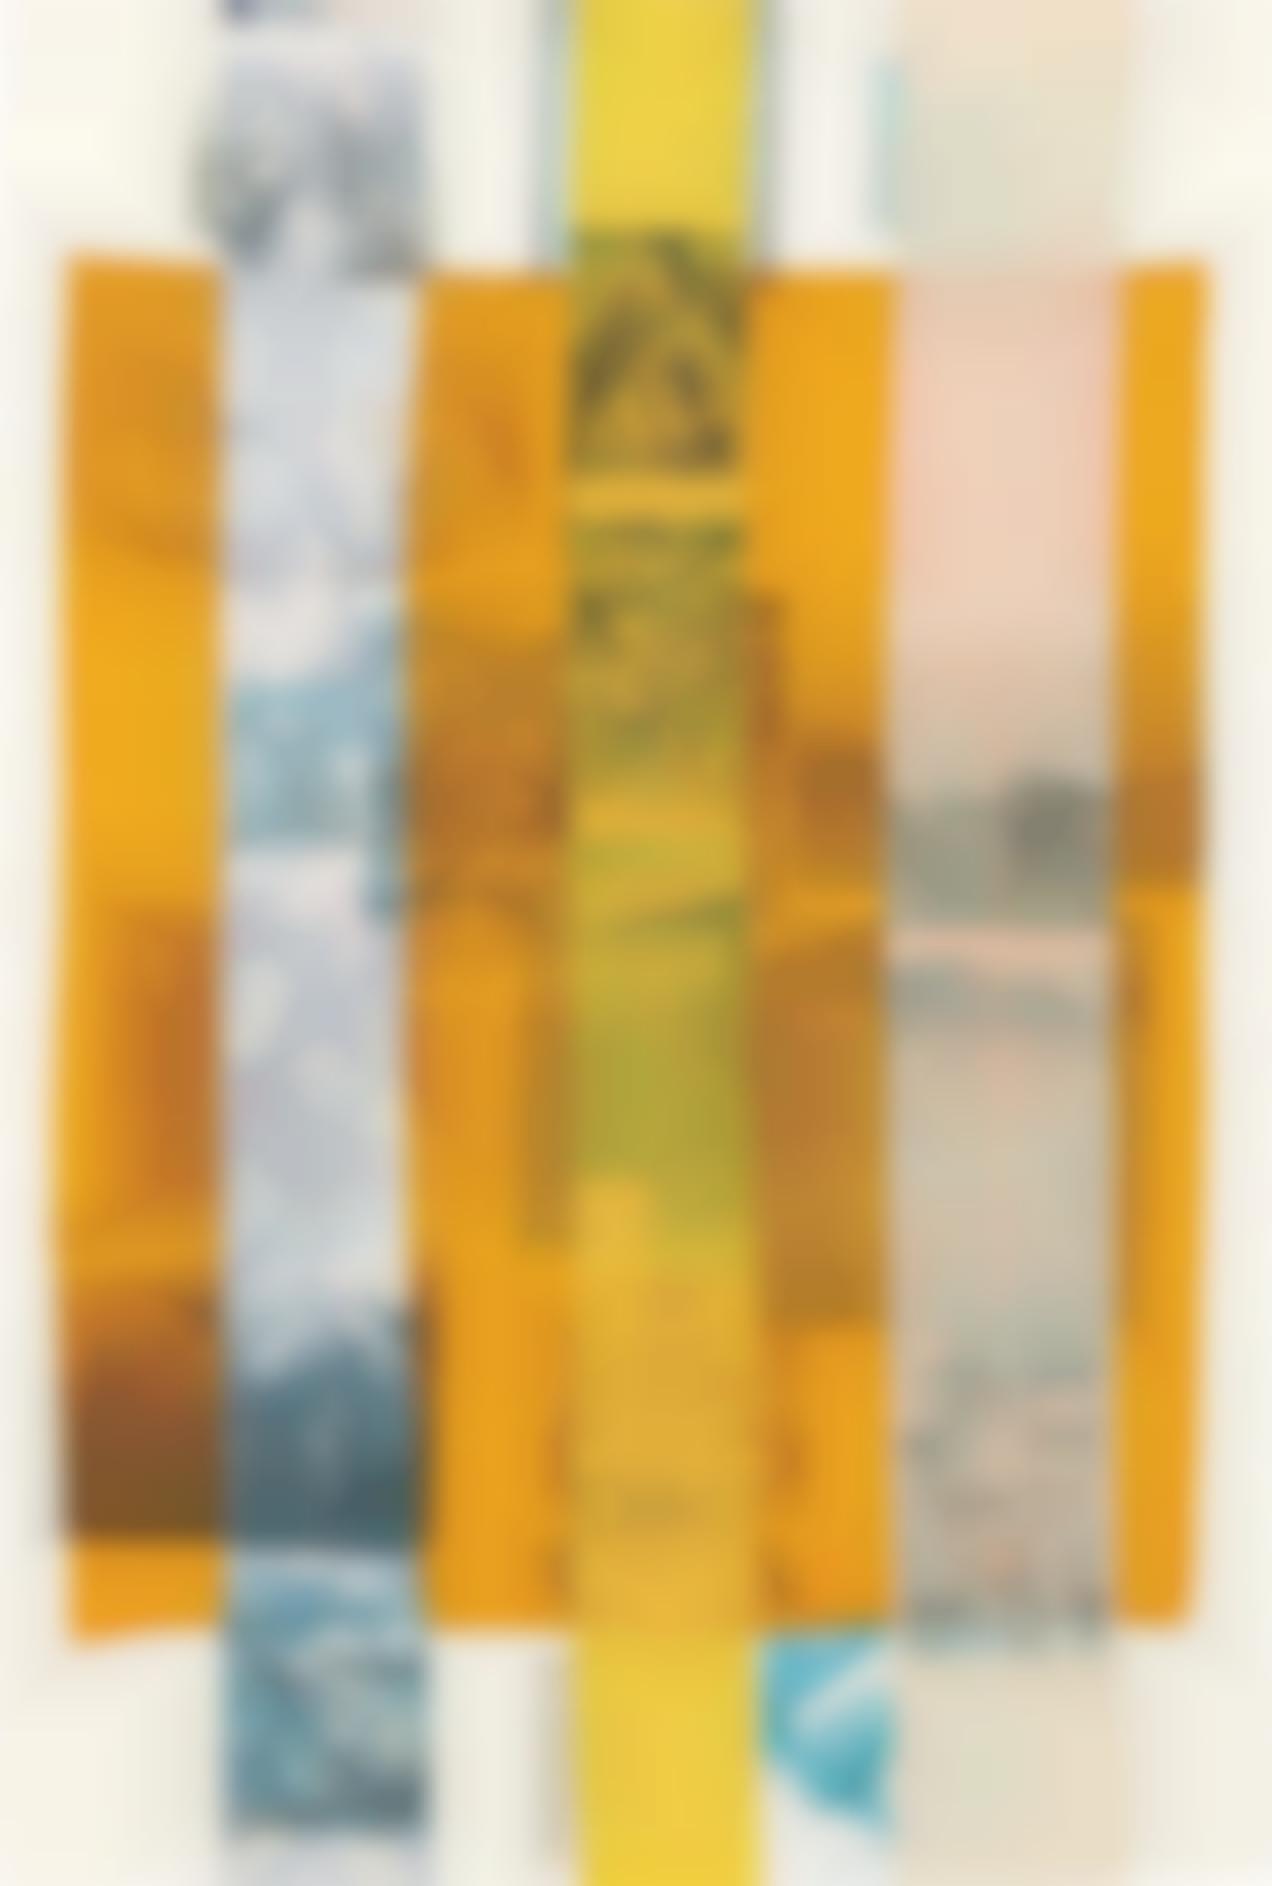 Robert Rauschenberg-Prime-Run (Slide)-1979